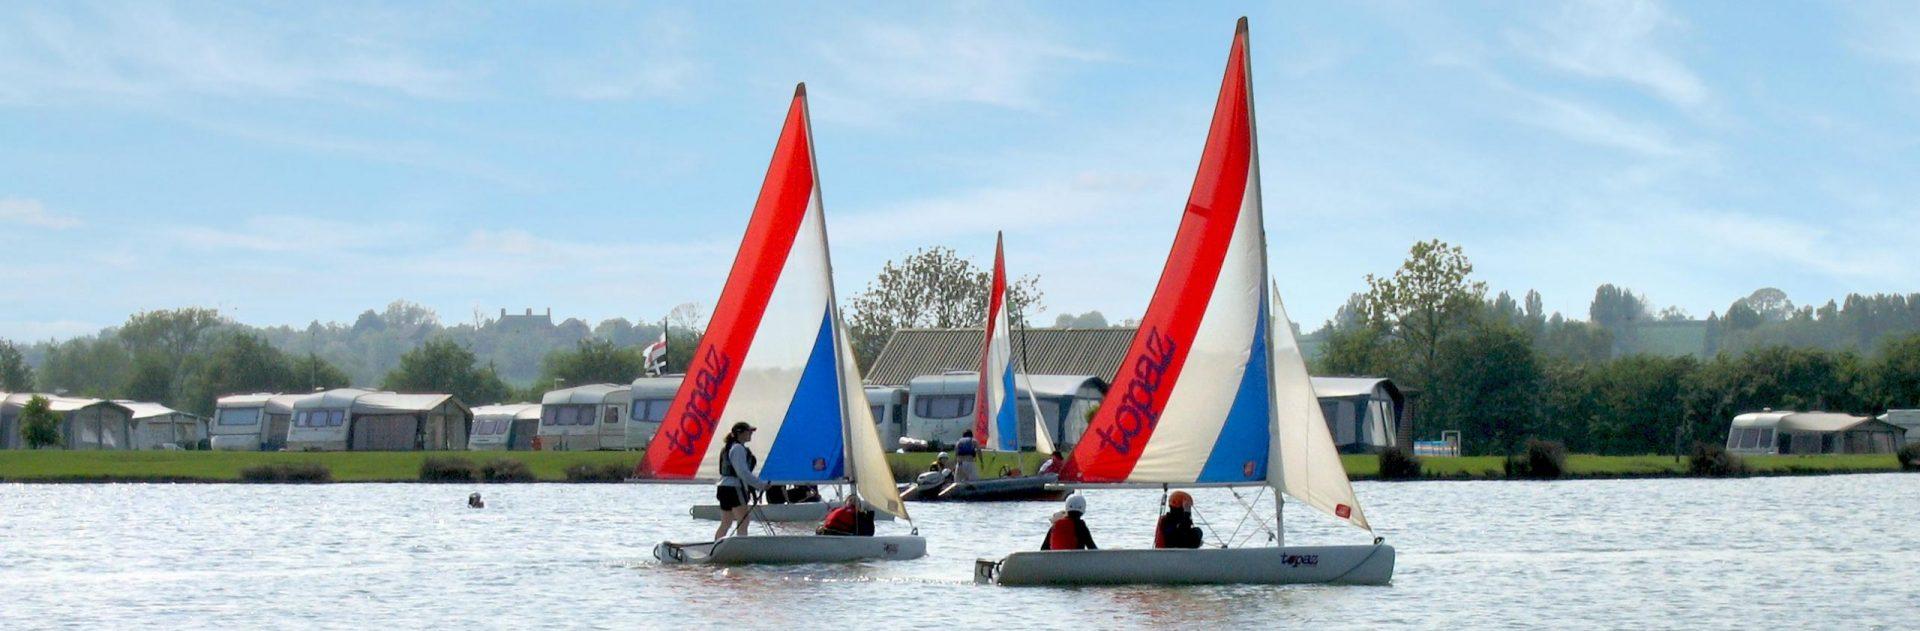 JCA Croft Farm sailing